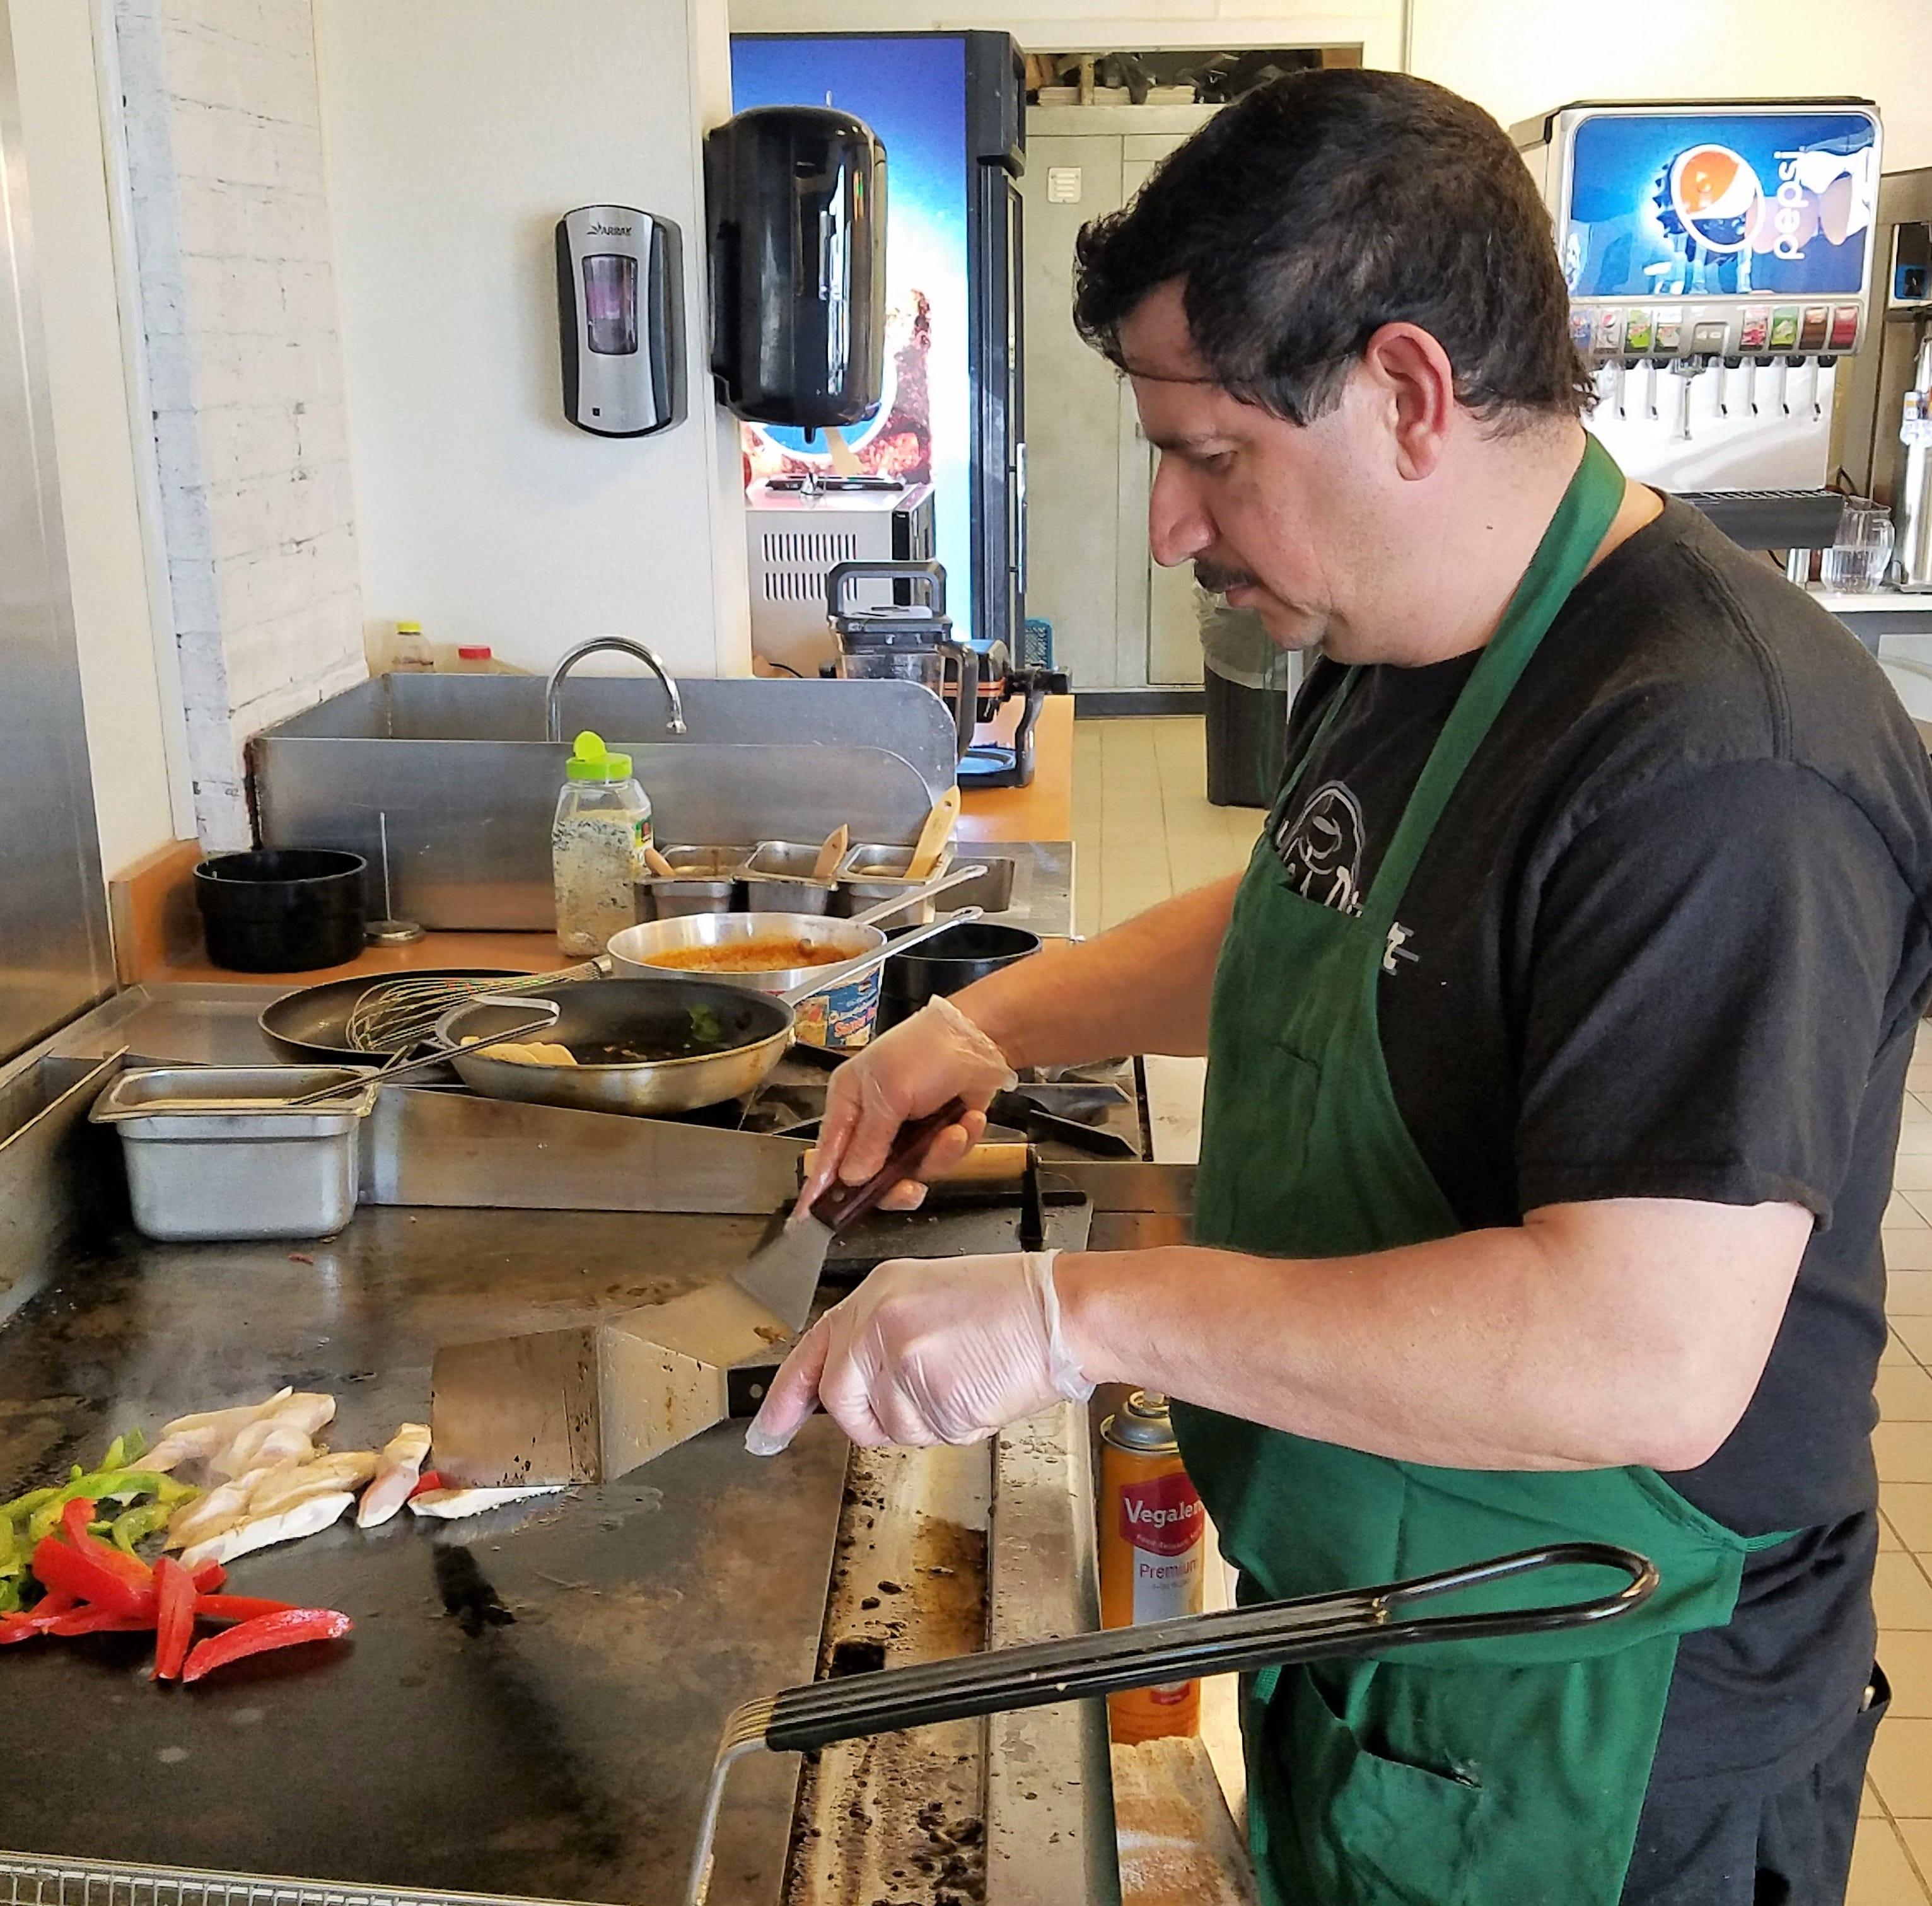 Mele's Diner brings breakfast, Tex-Mex, comfort classics to East Side